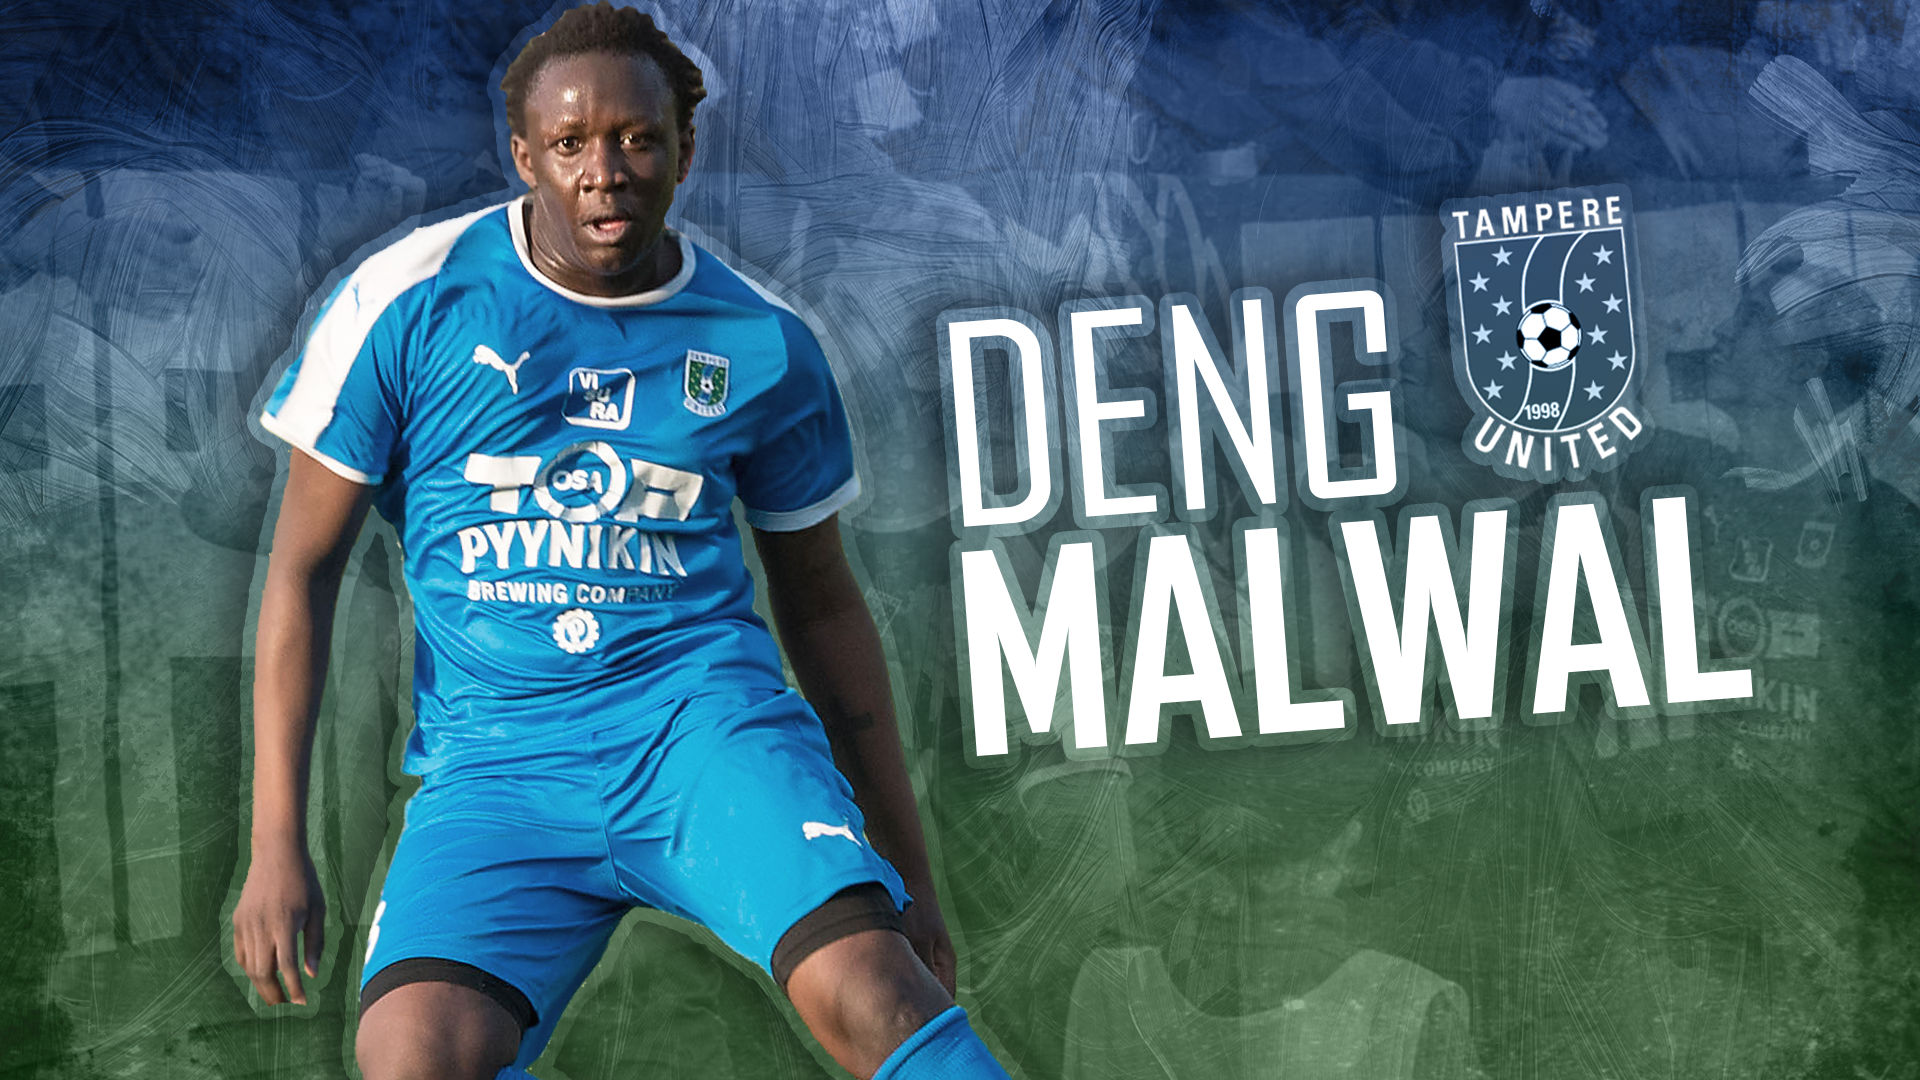 Deng Malwal vahvistaa Tampere Unitedia -uutiskuva